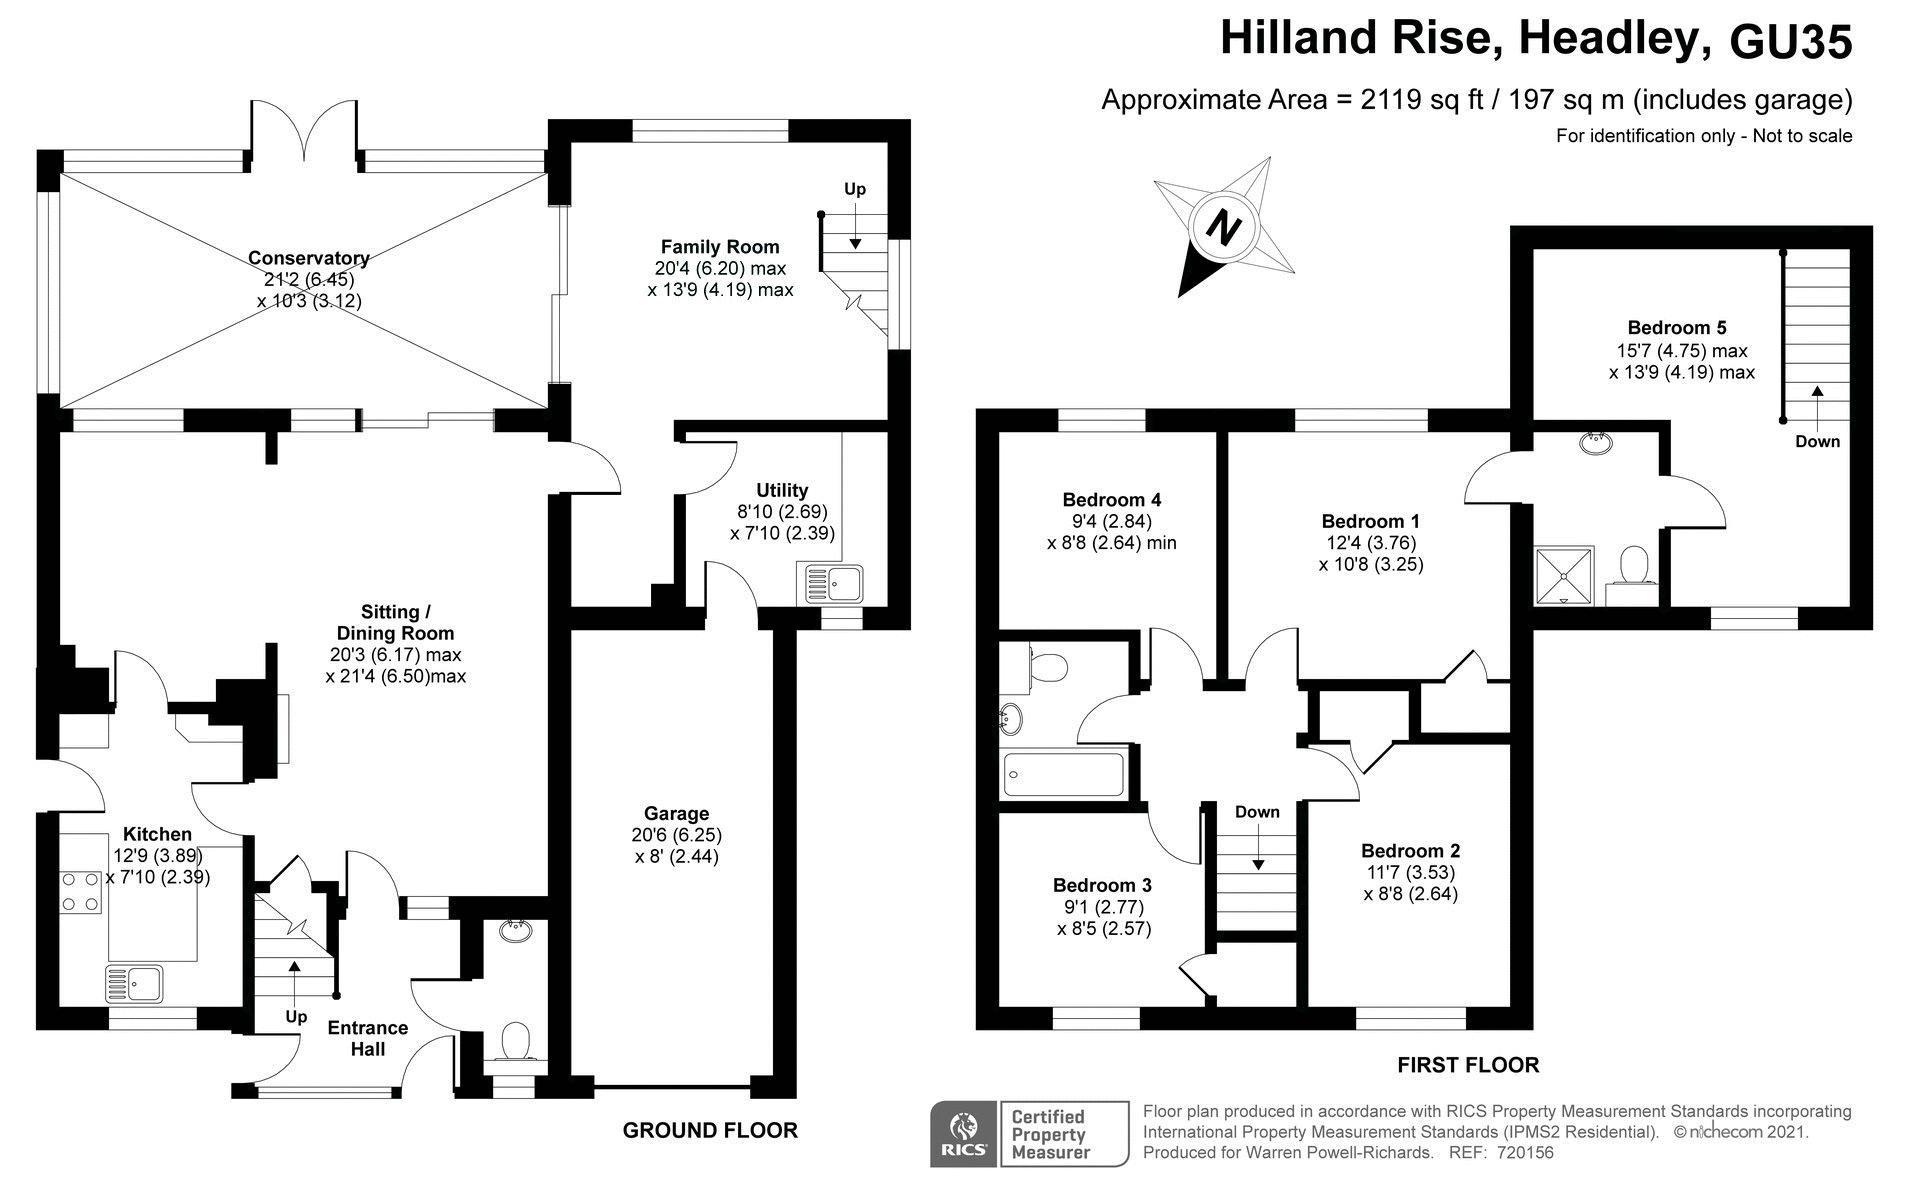 Hilland Rise